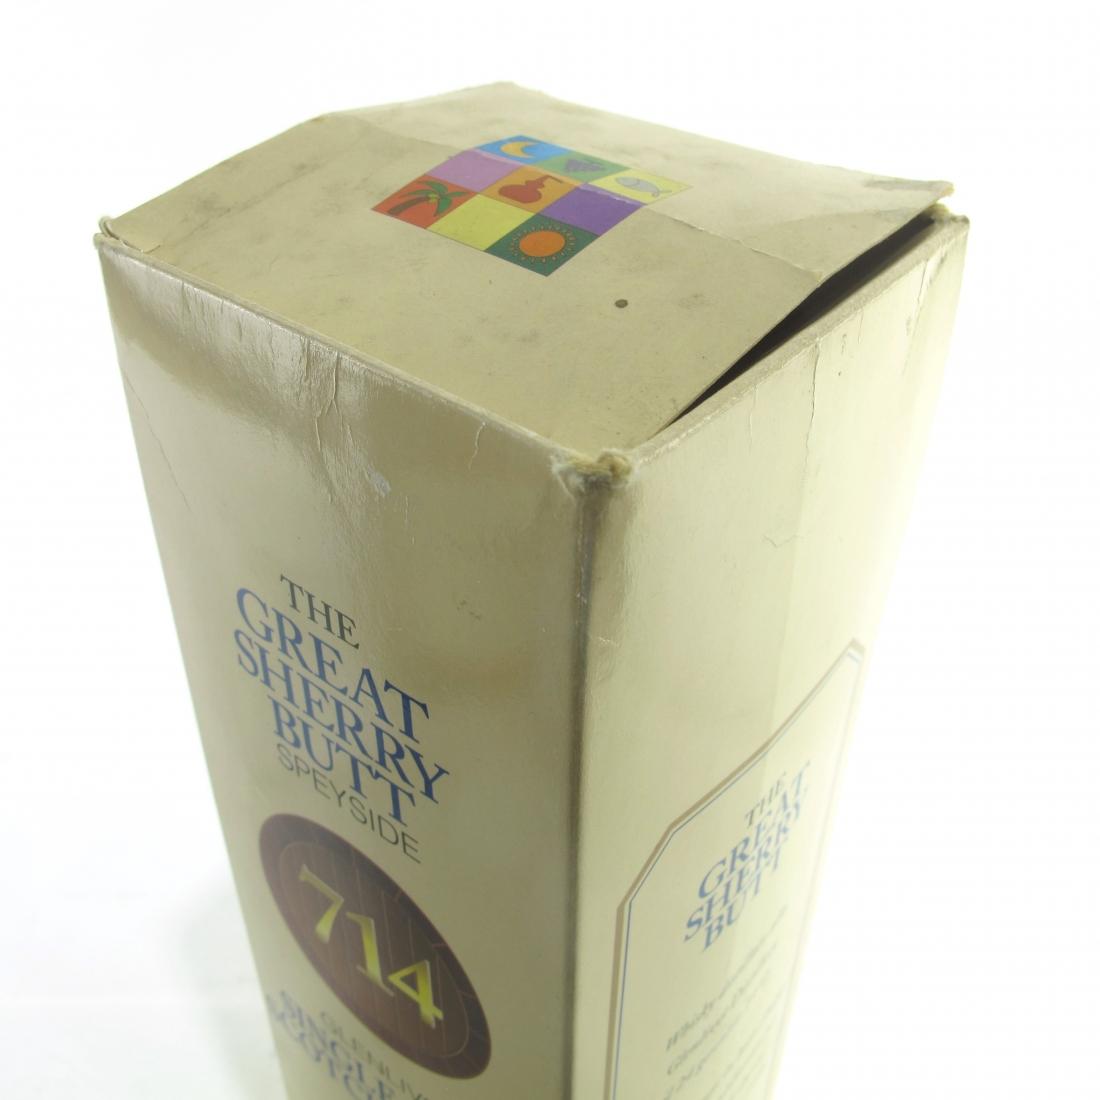 Glenlivet 1972 Signatory Vintage Great Sherry Butt / Velier Import